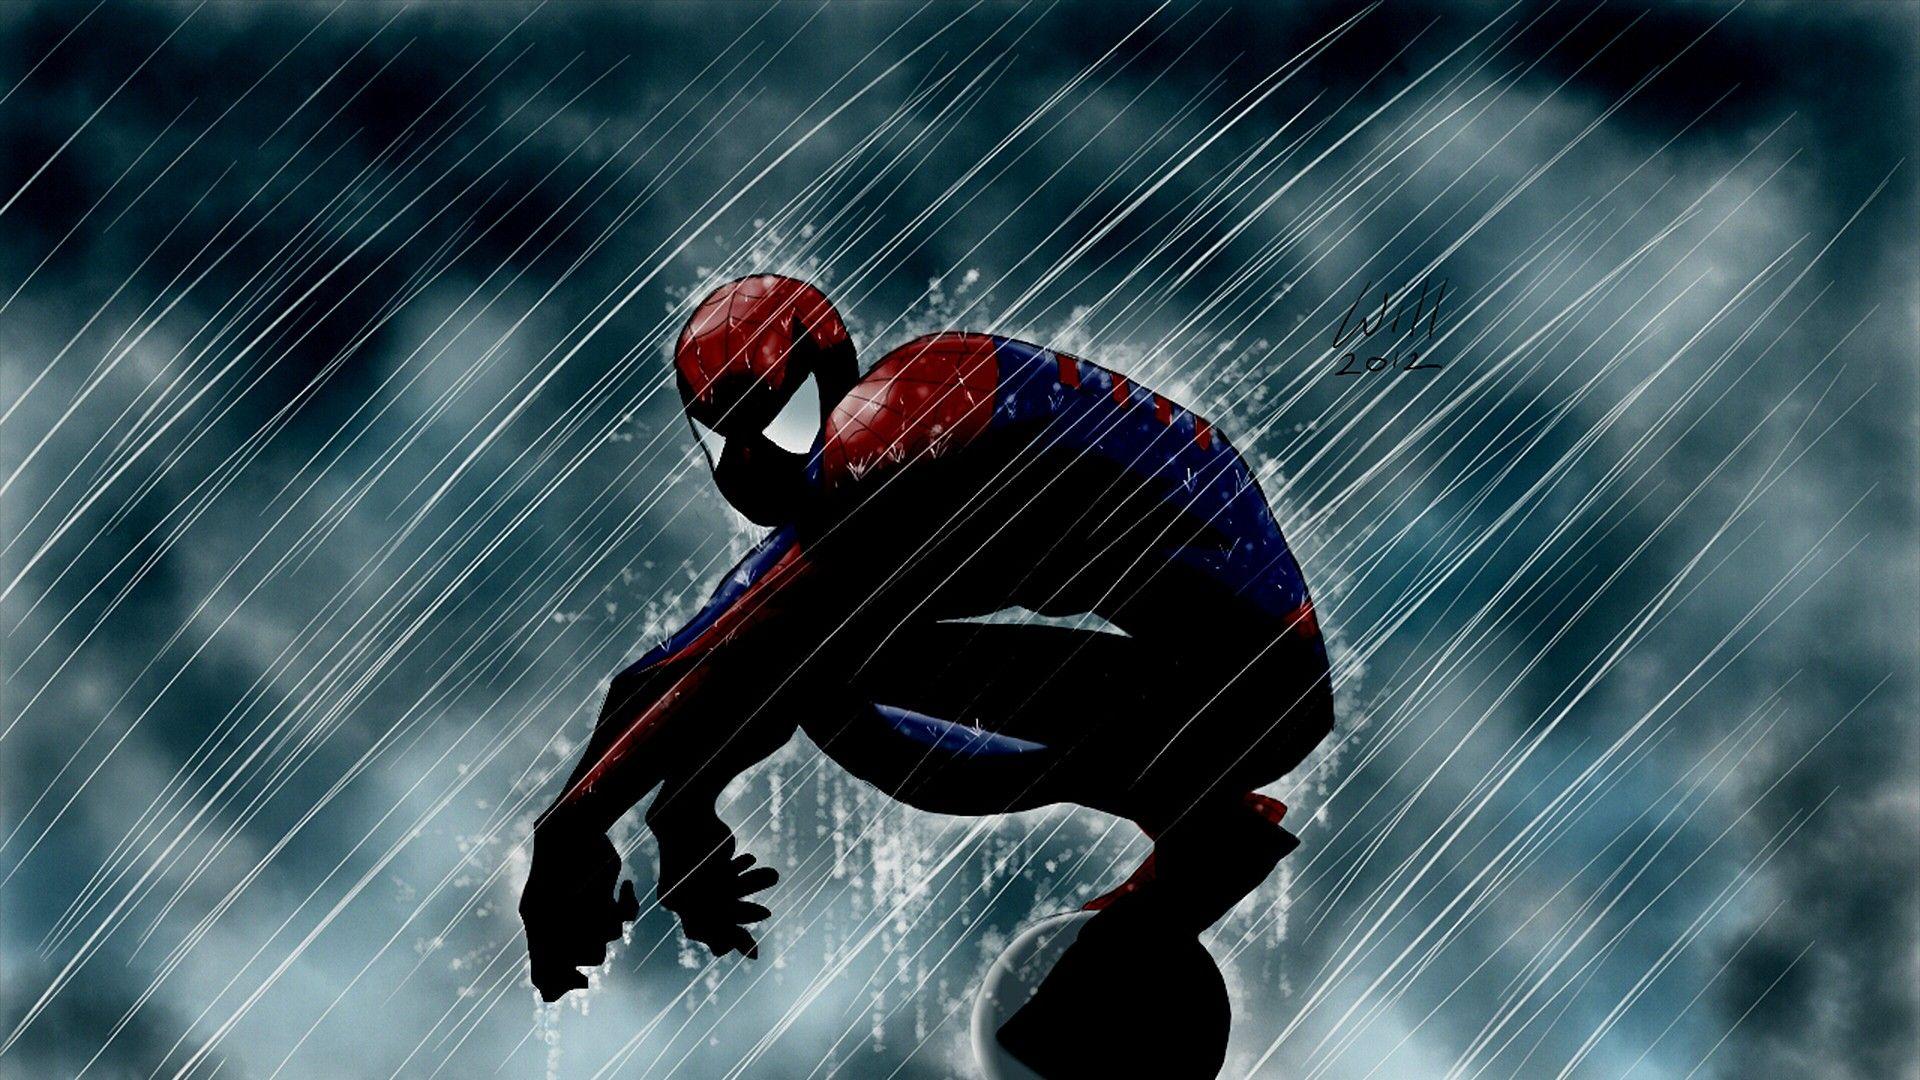 Download Spiderman Wallpaper For iPhone iPad 1920x1080